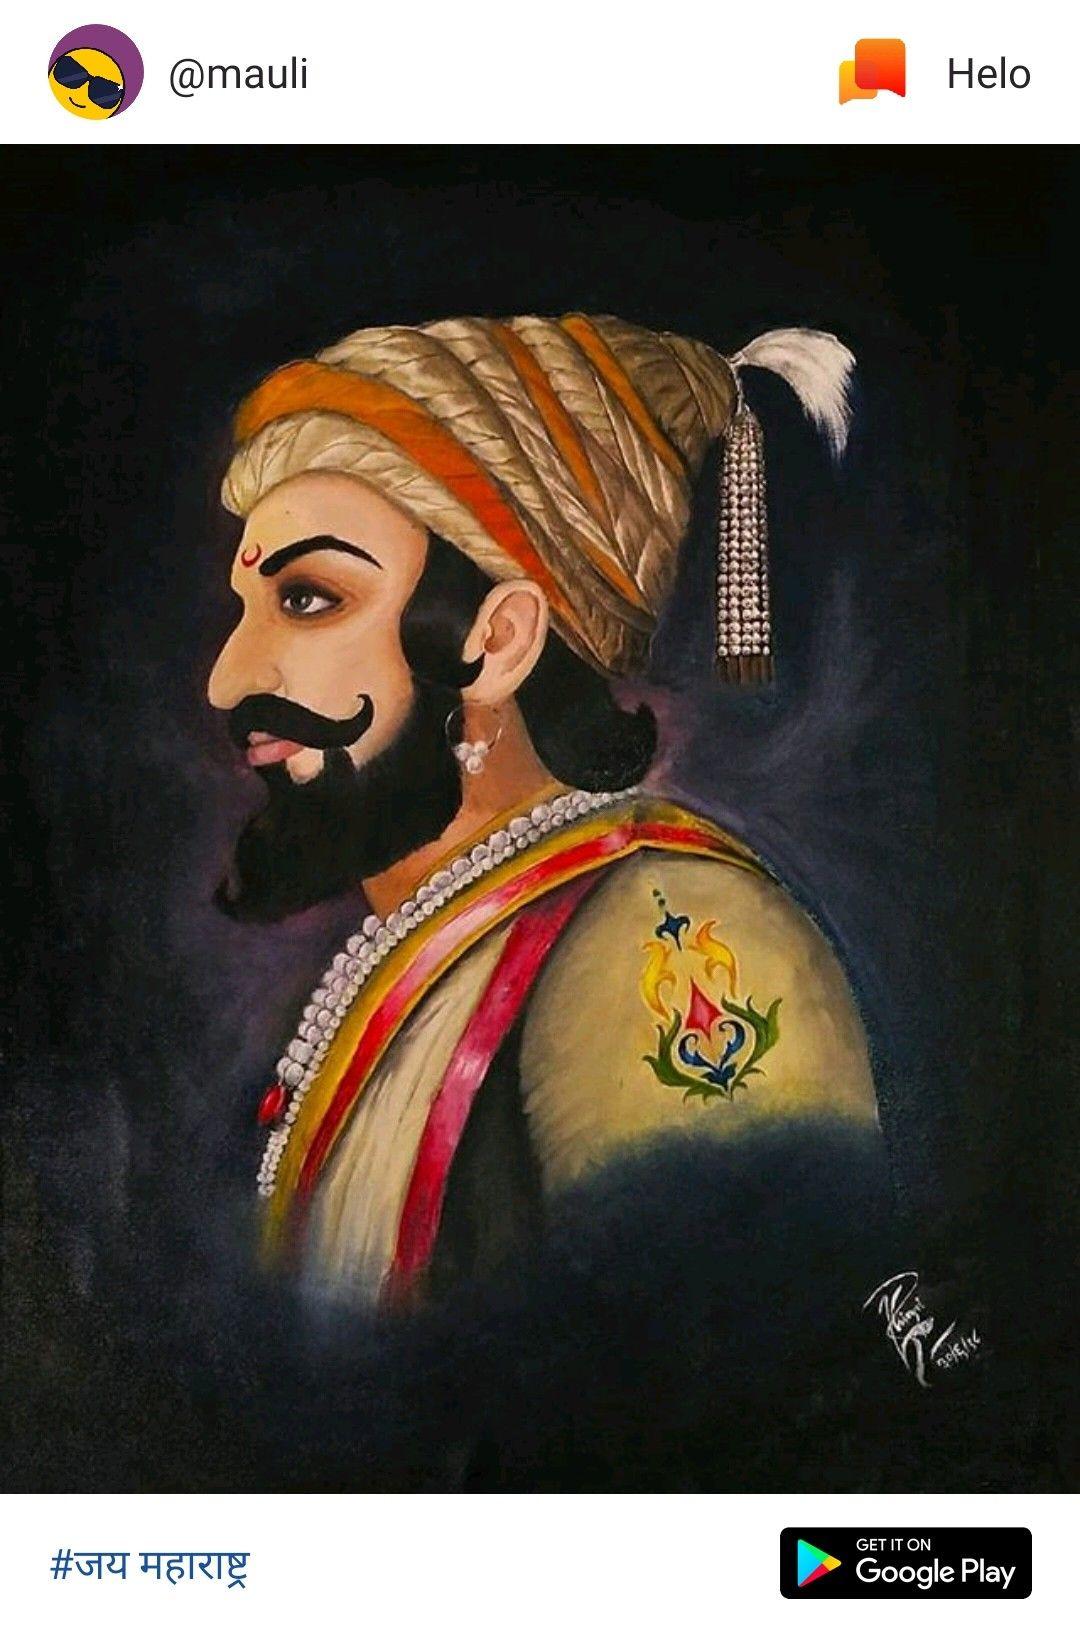 Shivaji Maharaj Hd Wallpaper, Hd Wallpapers 1080p, - Shivaji Maharaj Drawing With Colour , HD Wallpaper & Backgrounds